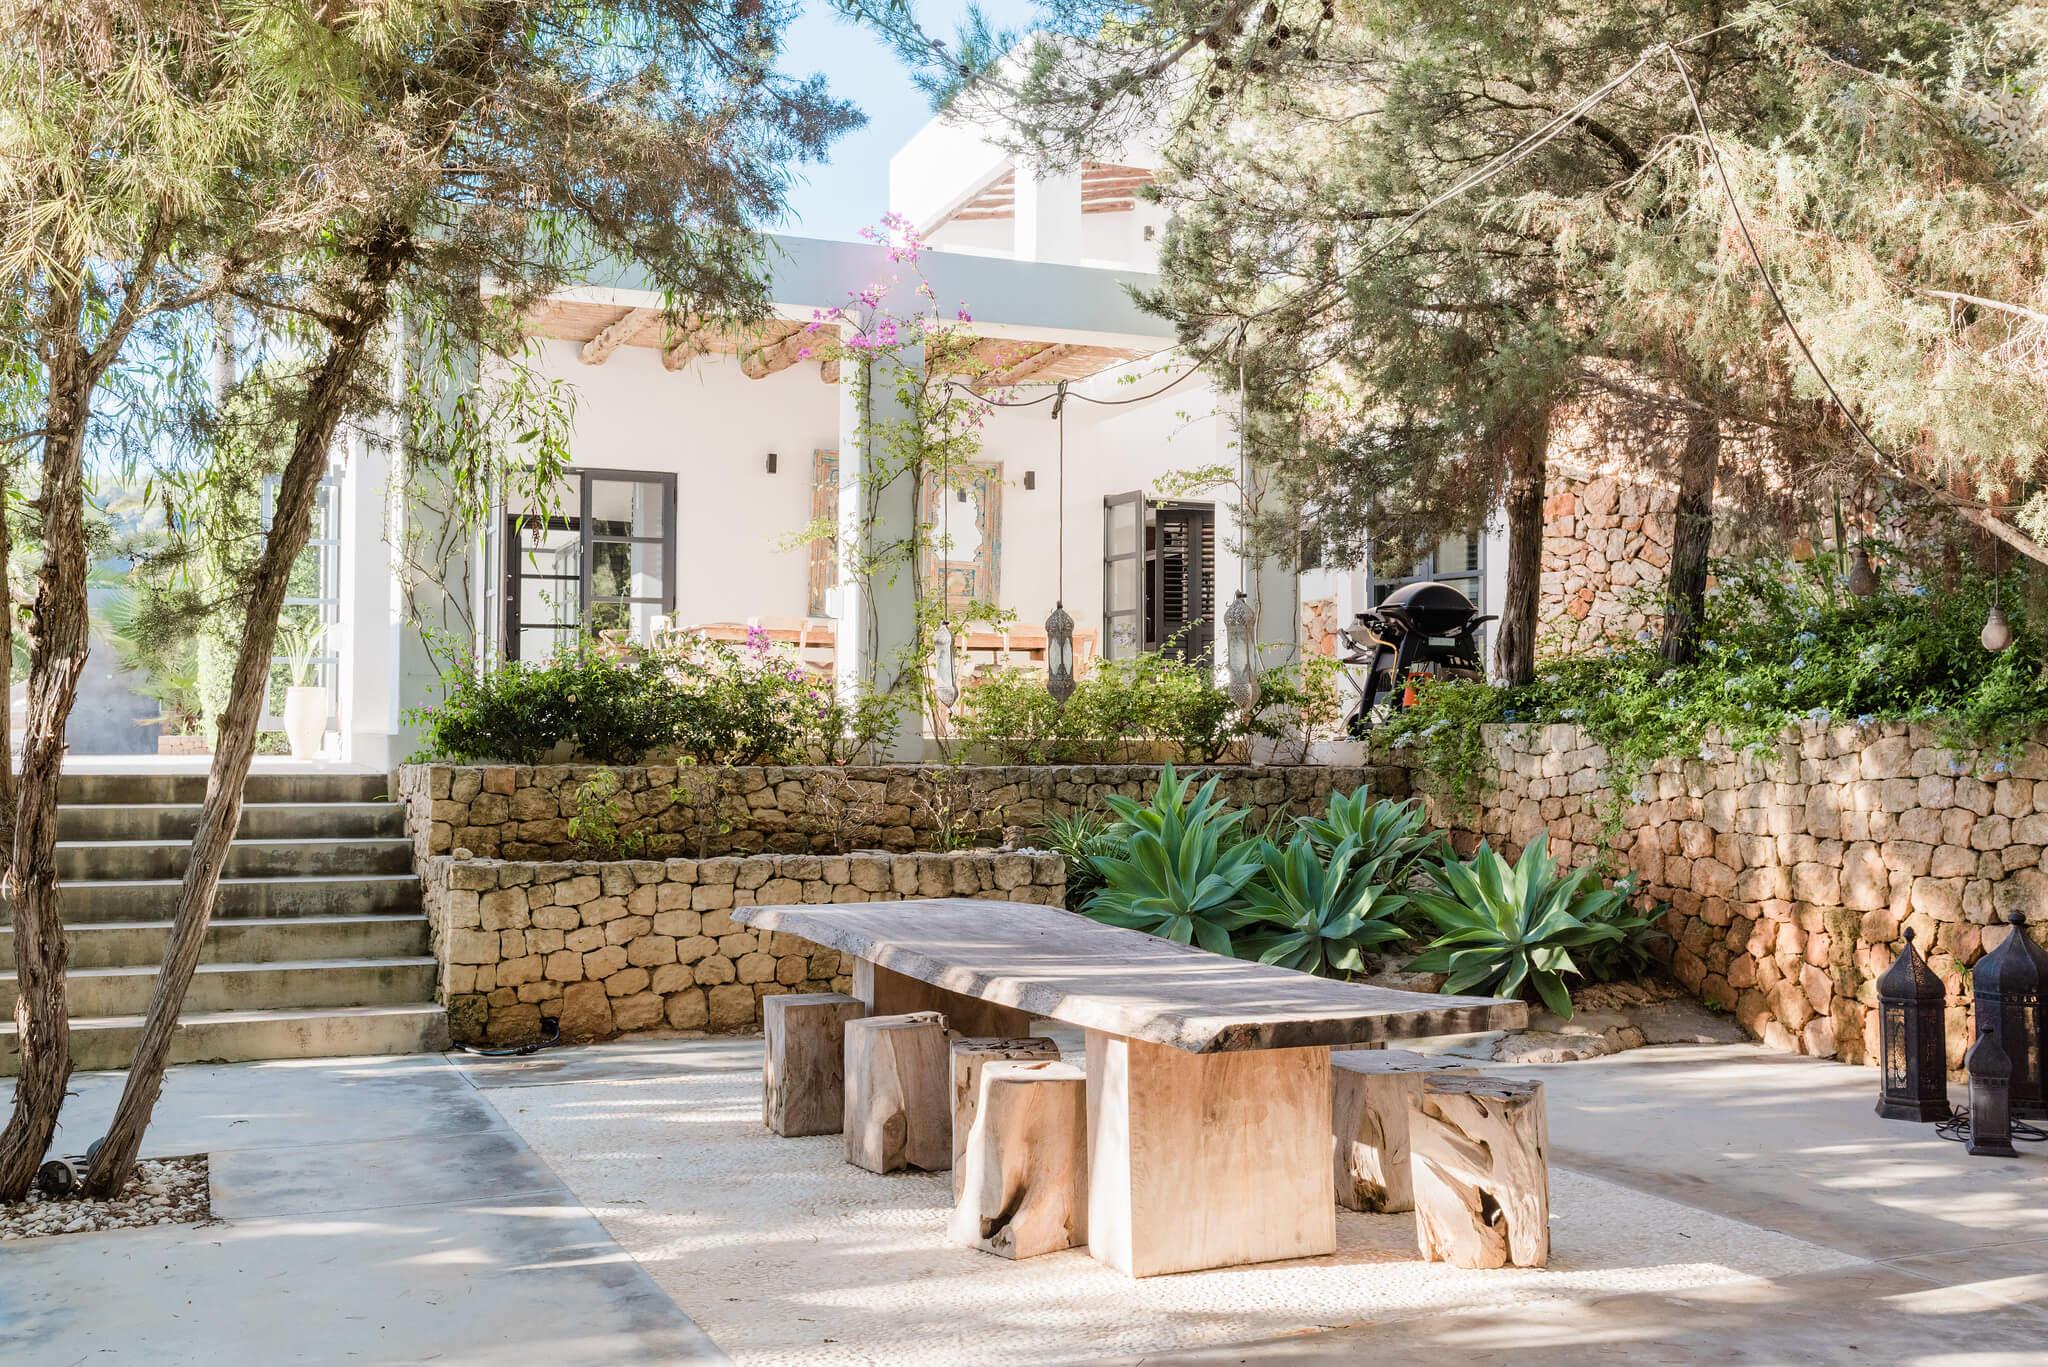 https://www.white-ibiza.com/wp-content/uploads/2020/05/white-ibiza-villas-casa-amalia-exterior-outside-dining2.jpg